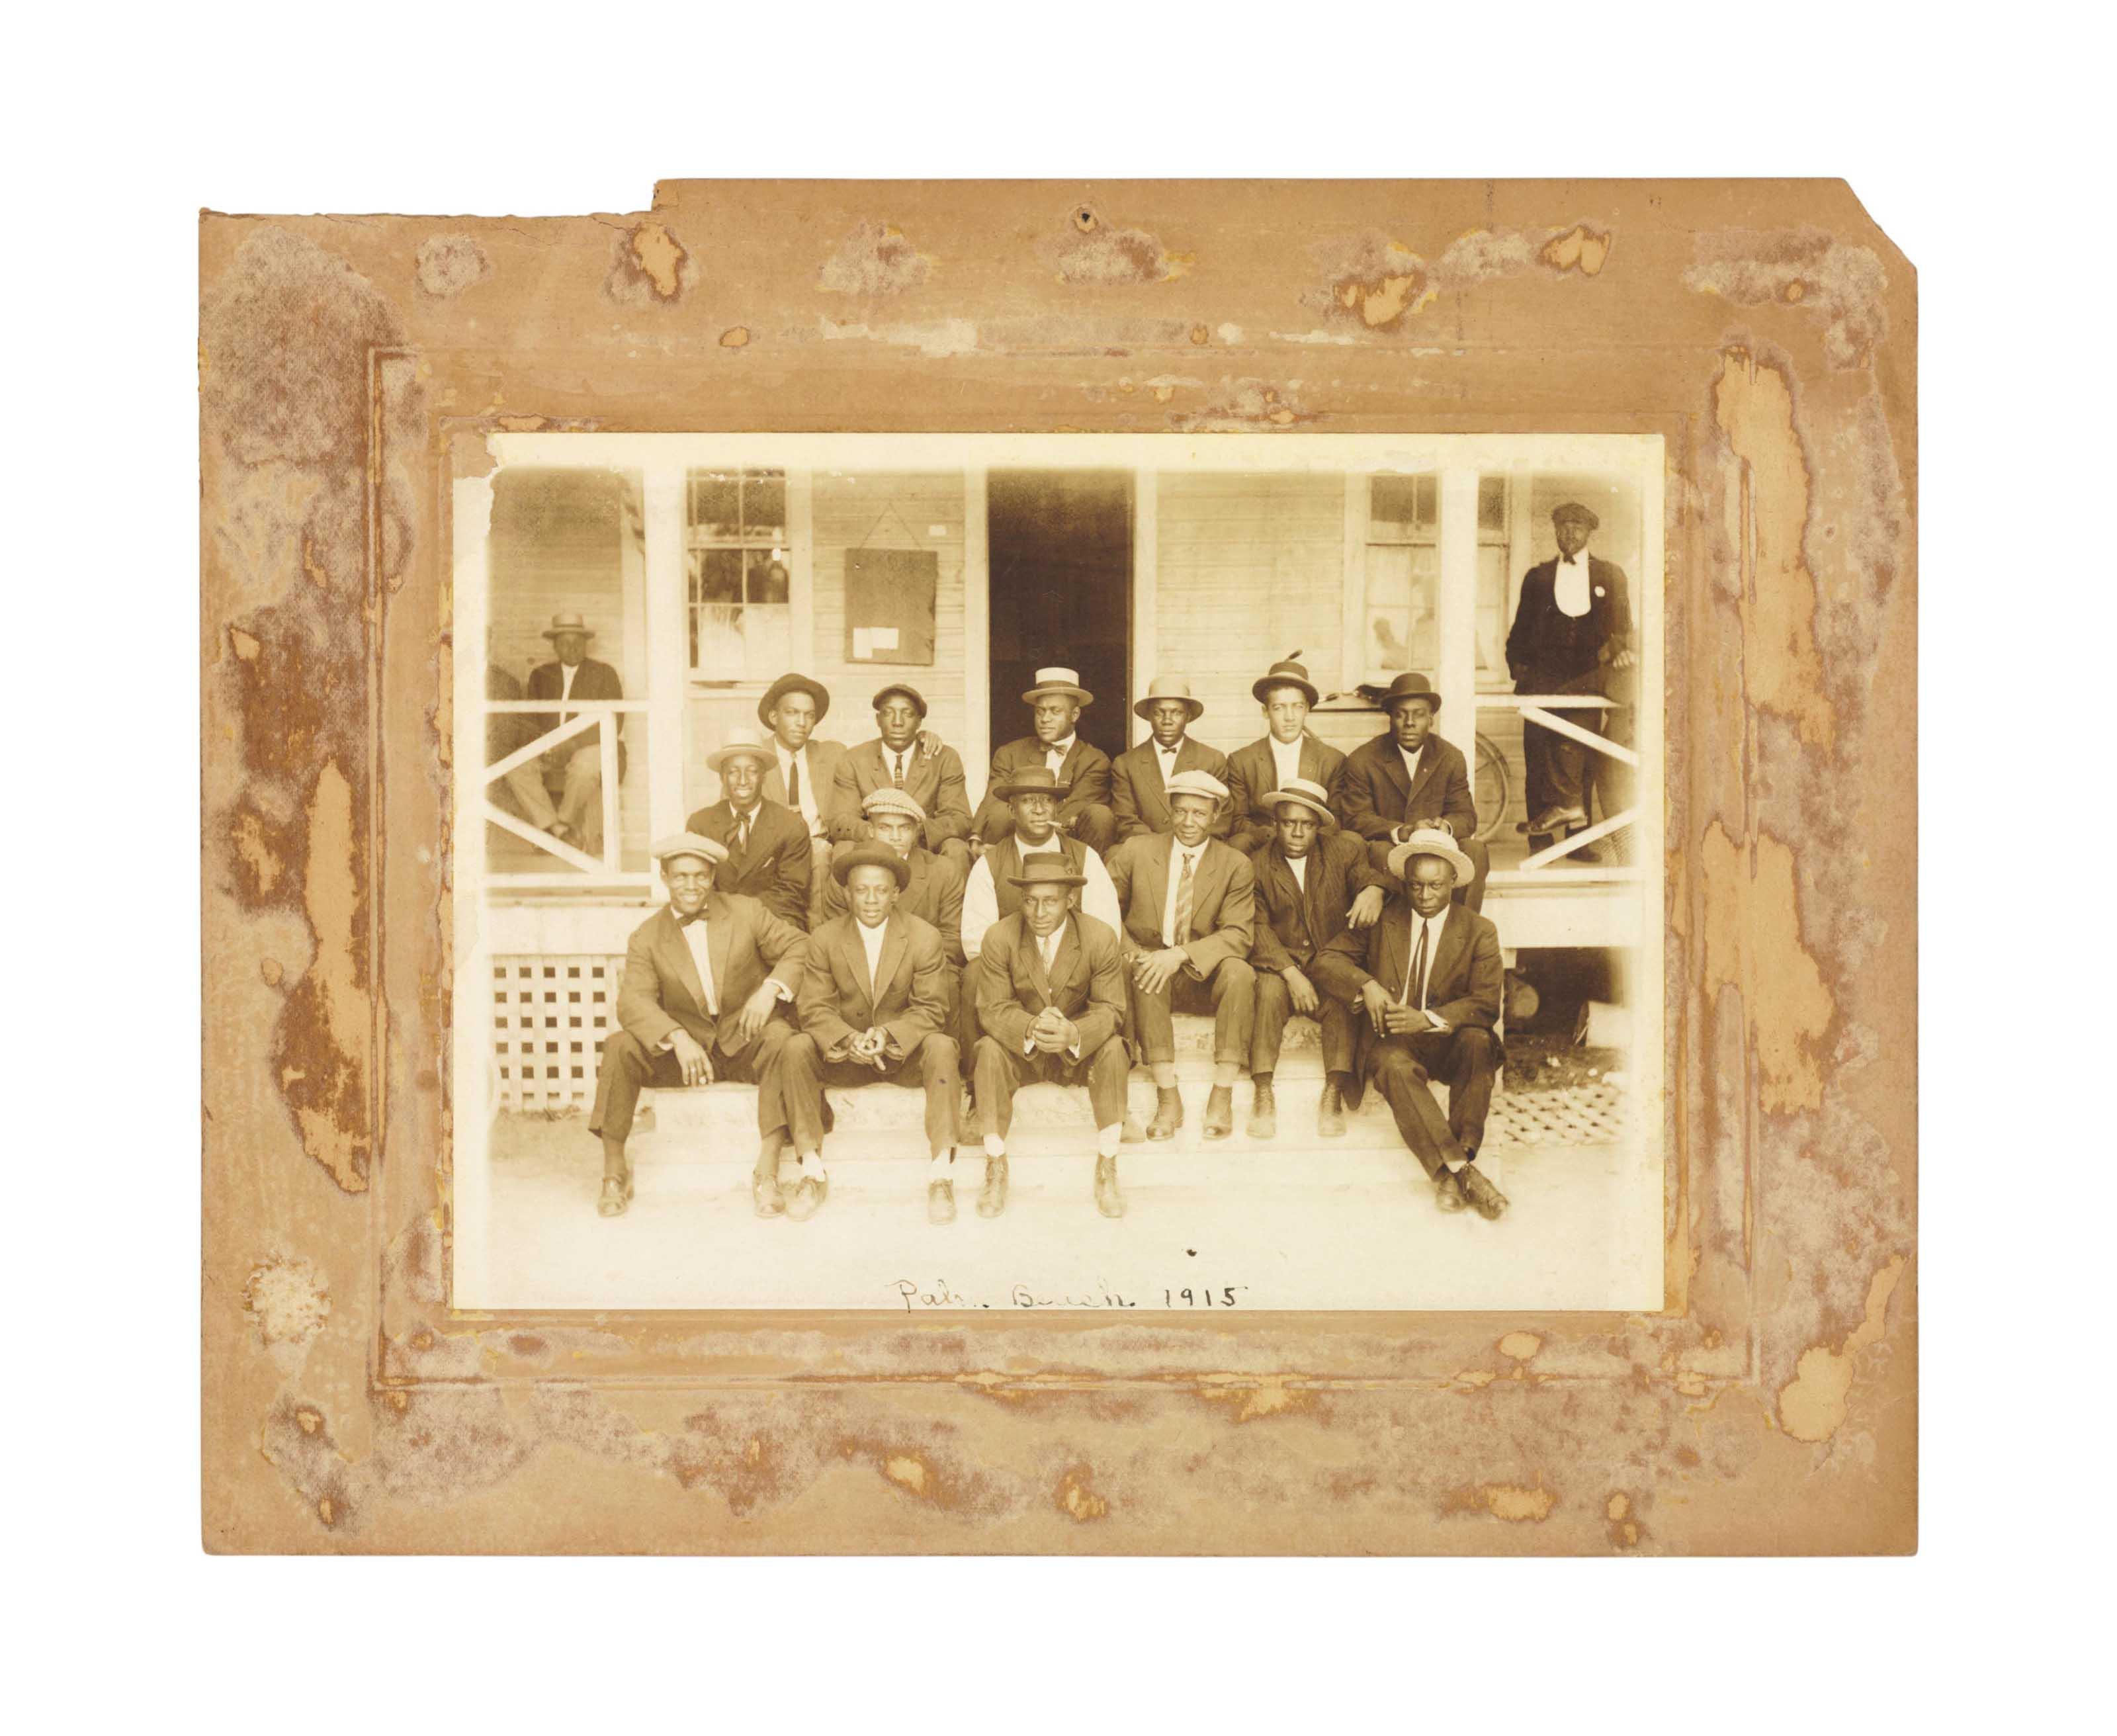 1915 PALM BEACH BREAKERS TEAM